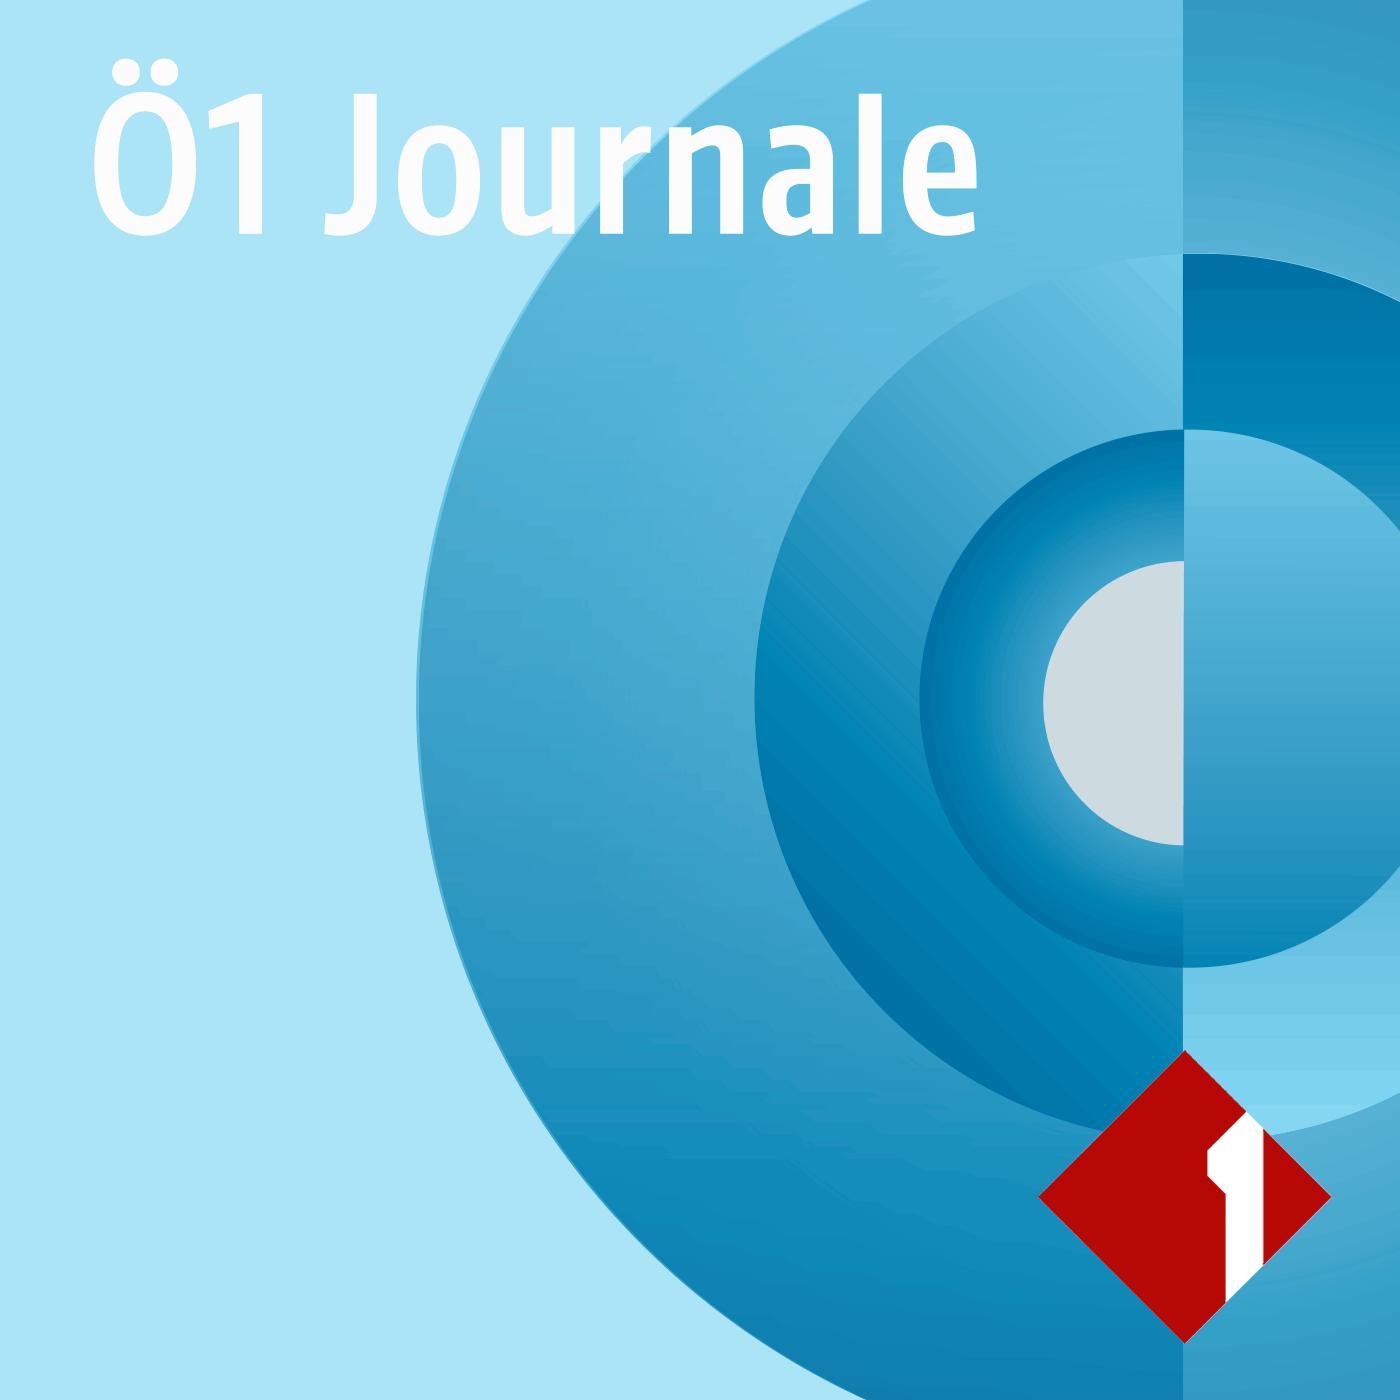 Ö1 Journale logo